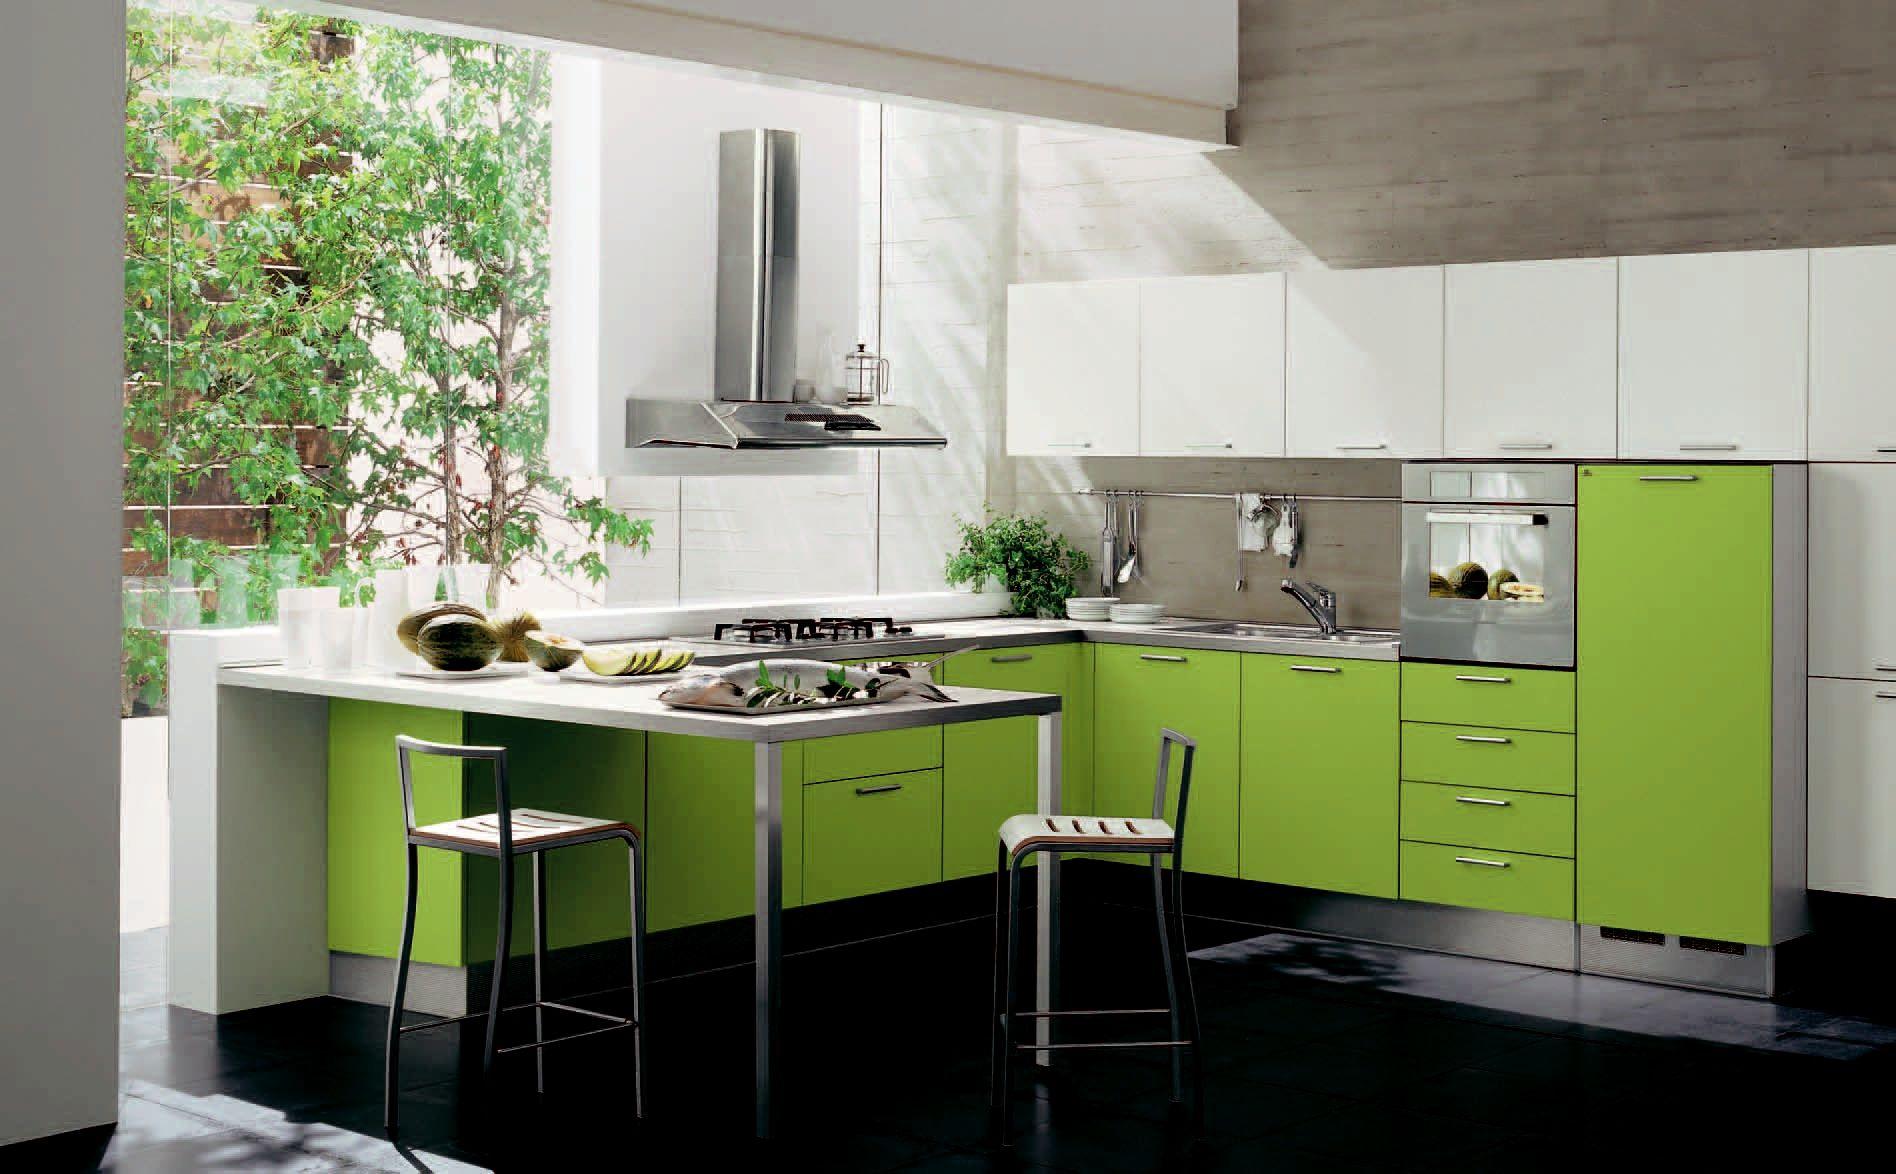 Kitchen design green amazing decoration decorating ideas